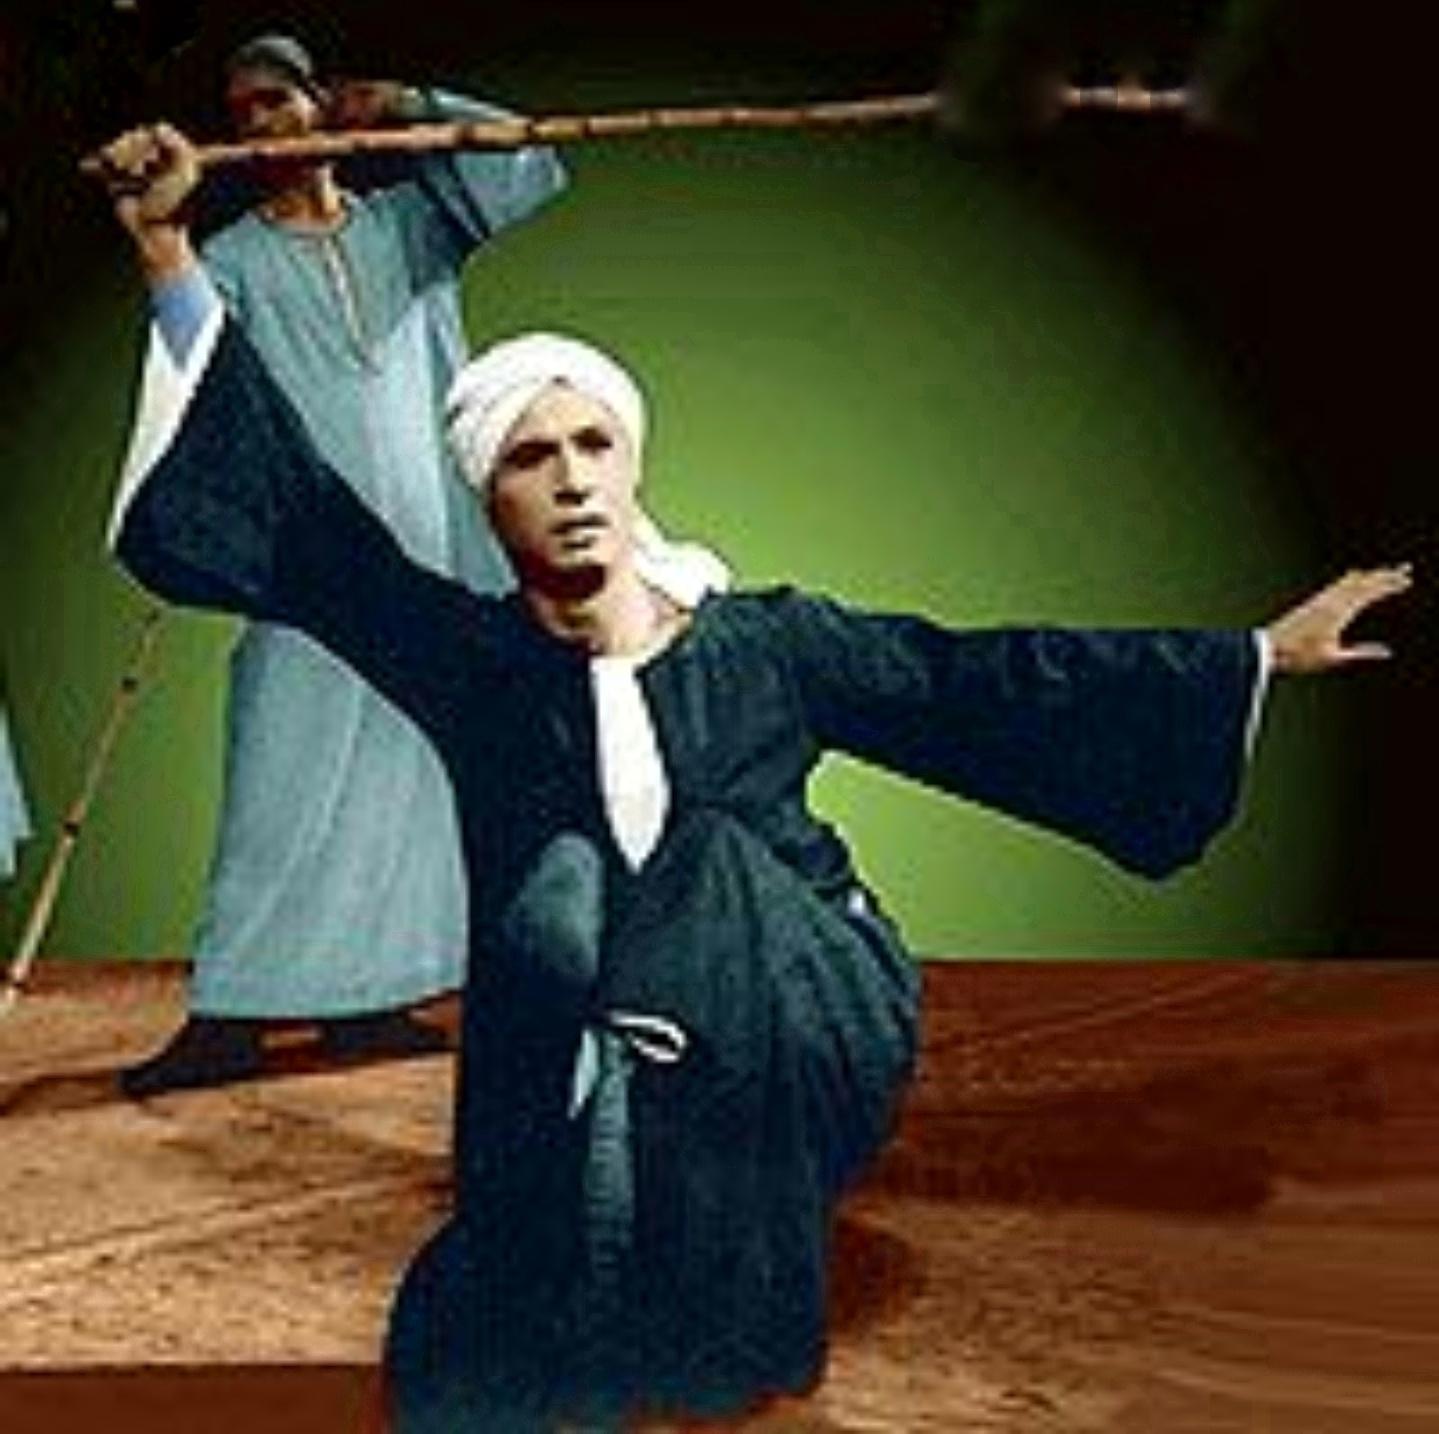 Mahmoud Reda - Mahmoud Reda- Tanz als Familienprojekt